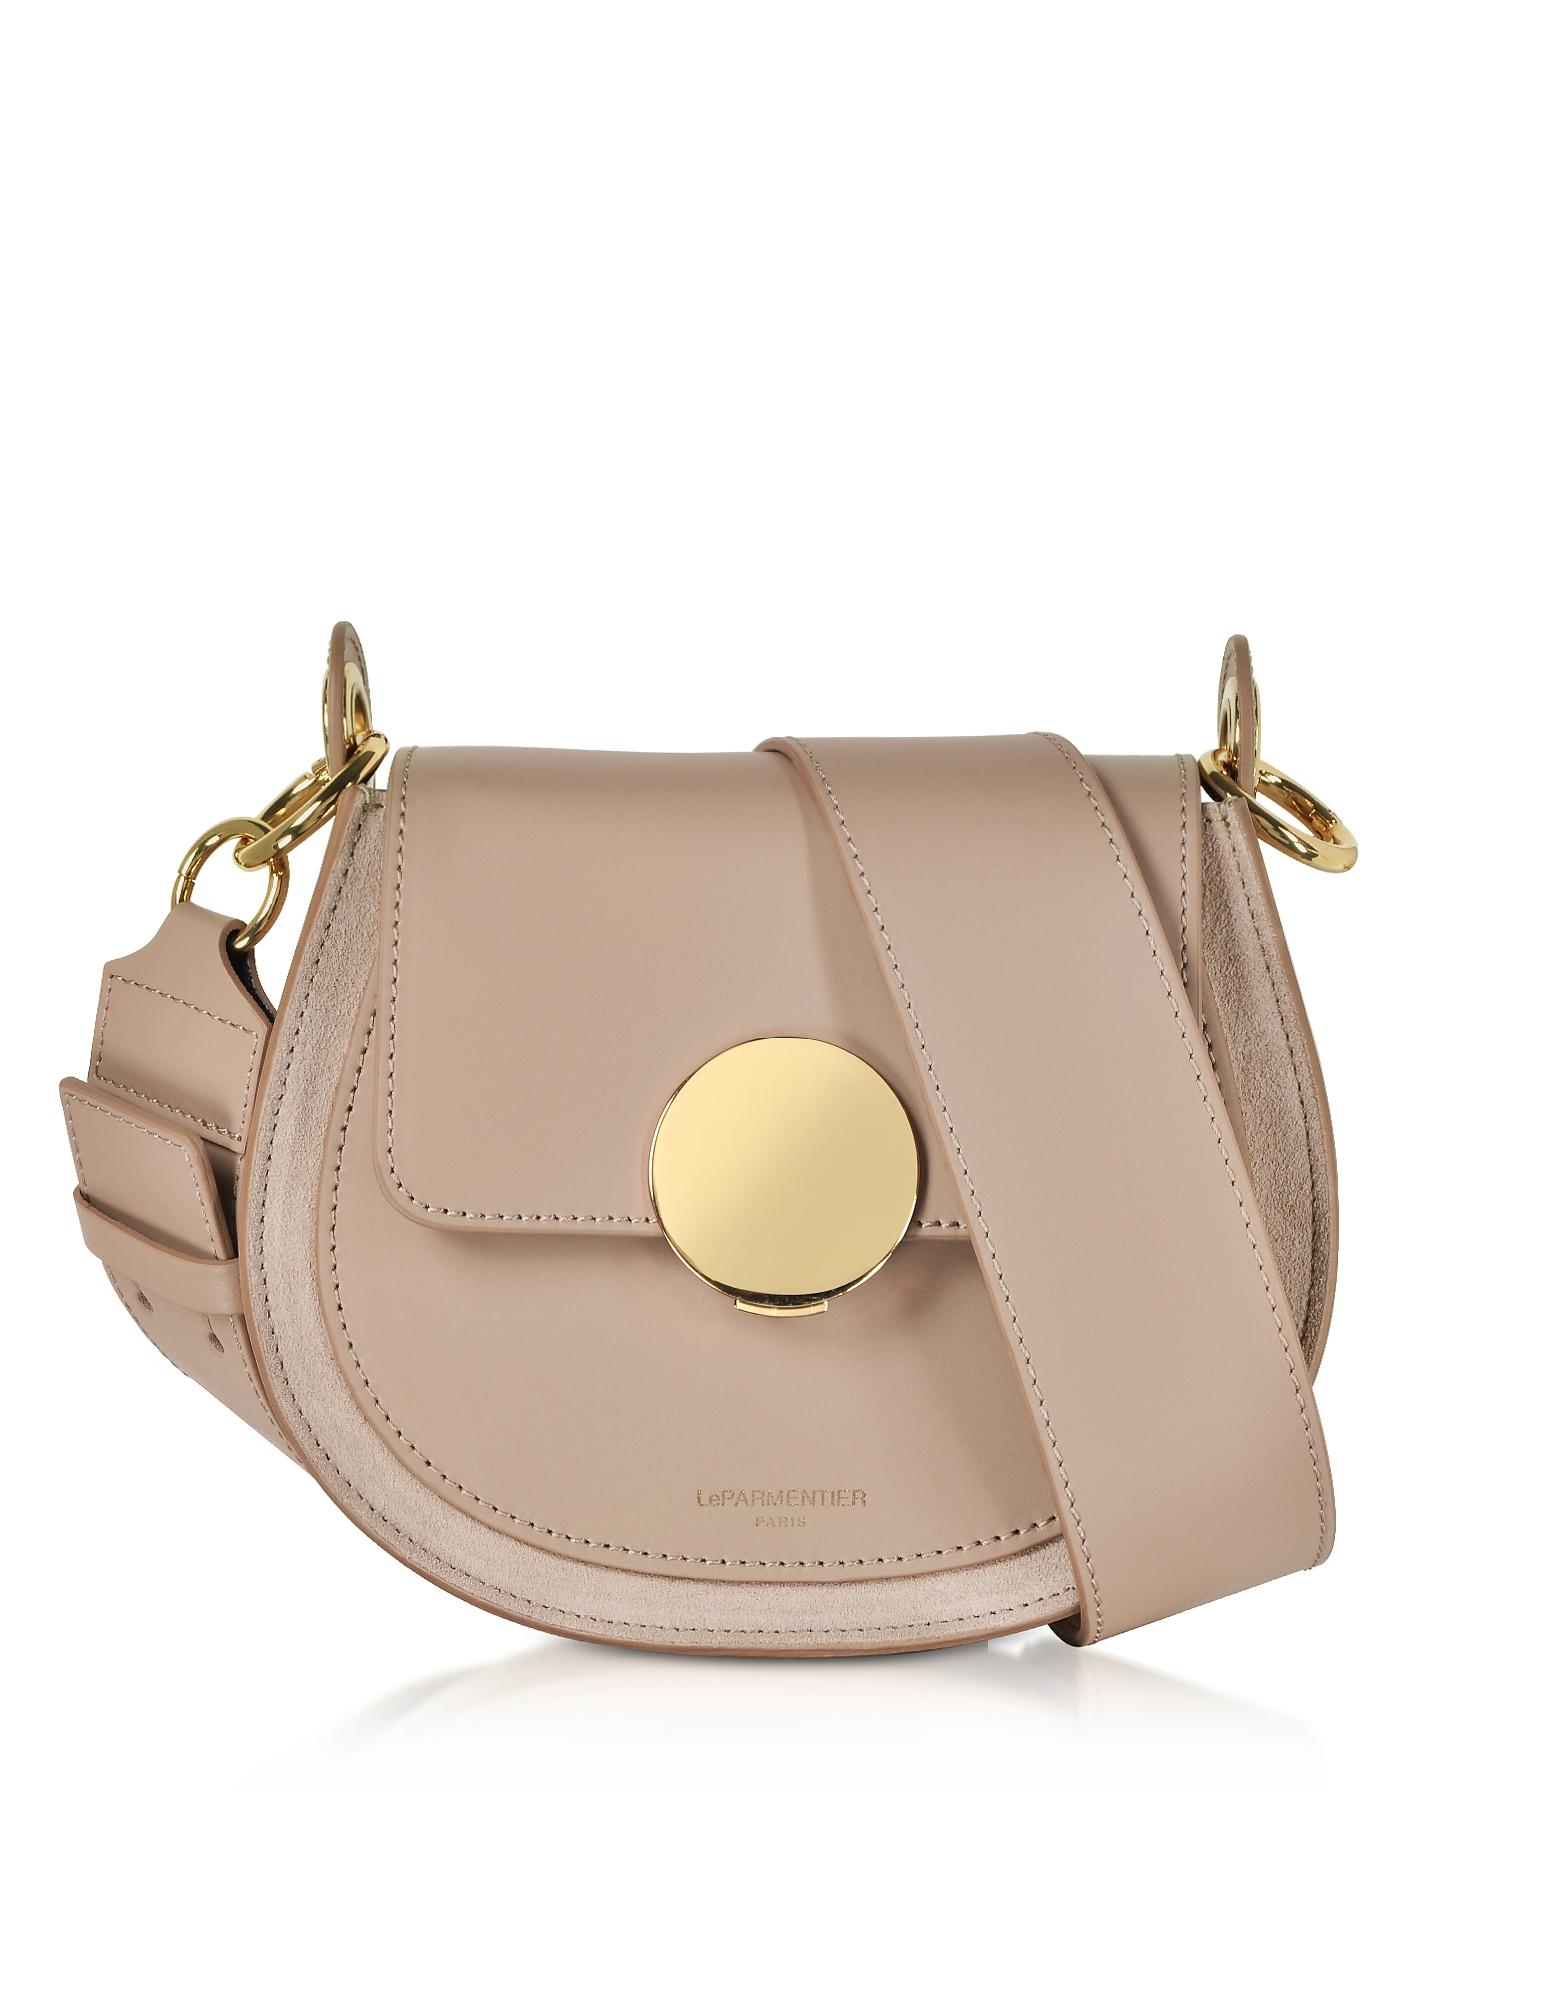 Le Parmentier  Handbags Yucca Suede and Leather Shoulder Bag